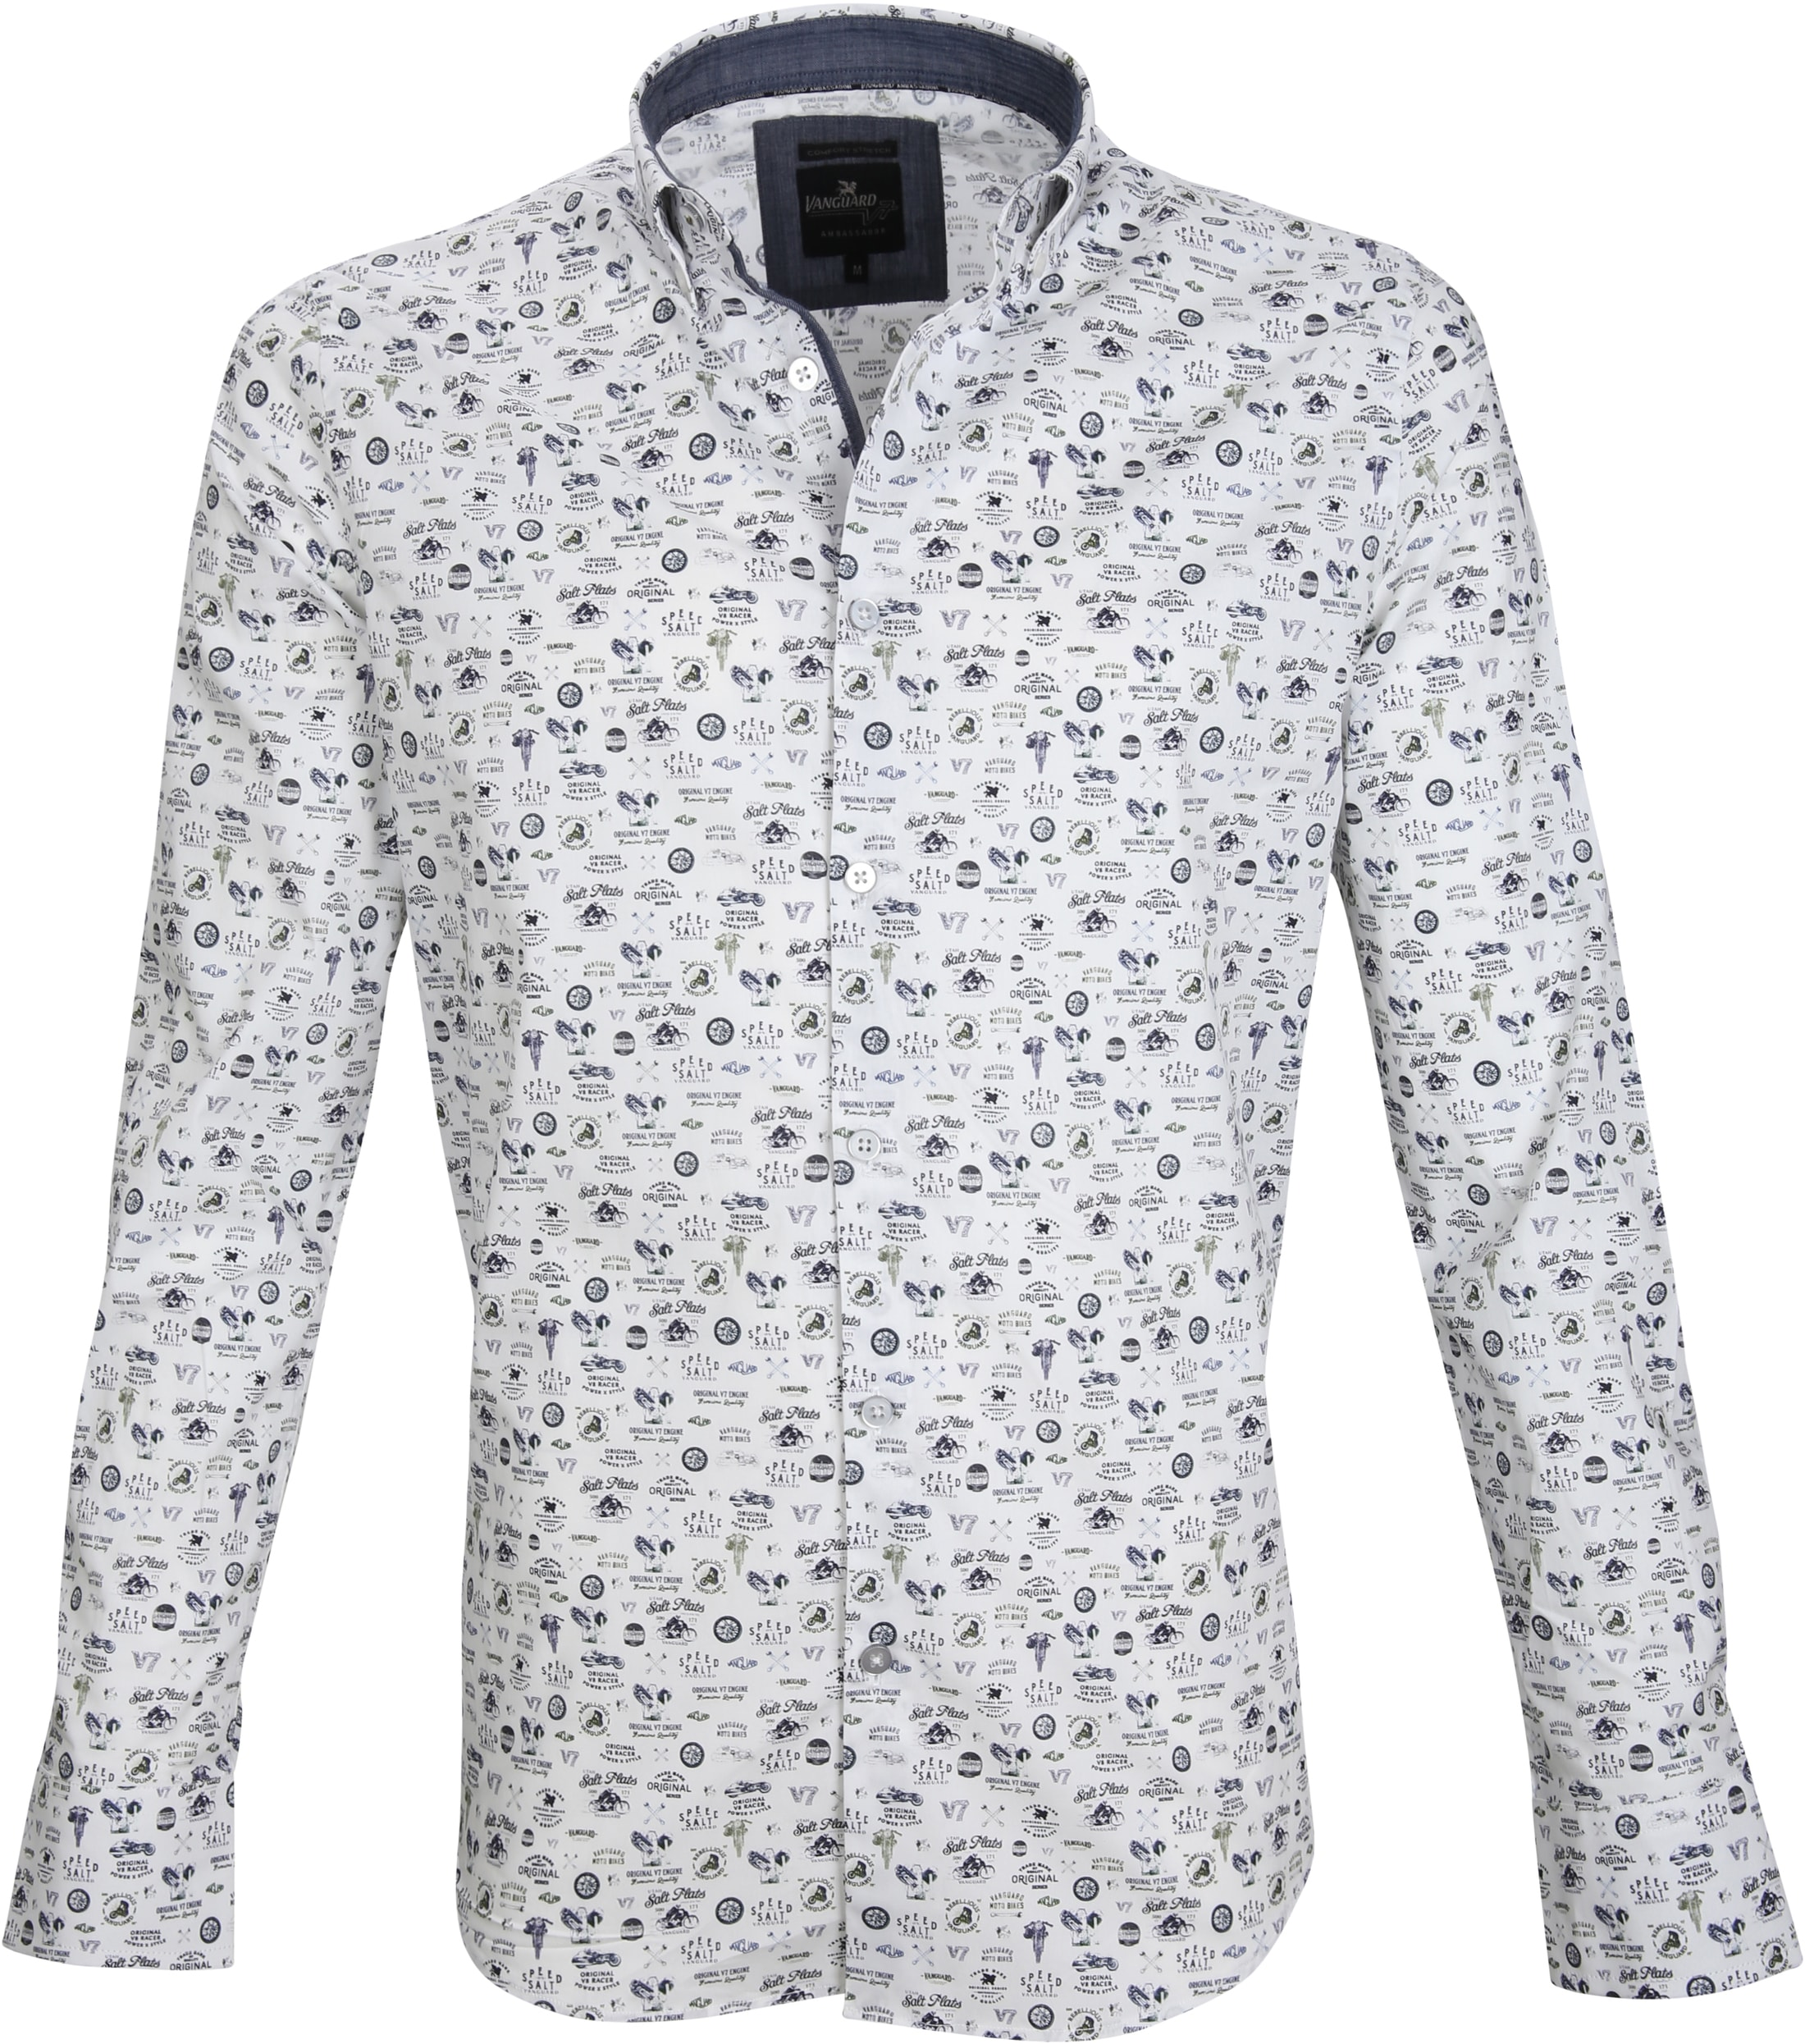 a13a1681a0f Vanguard Casual Shirt Print White VSI186402 order online | Suitable